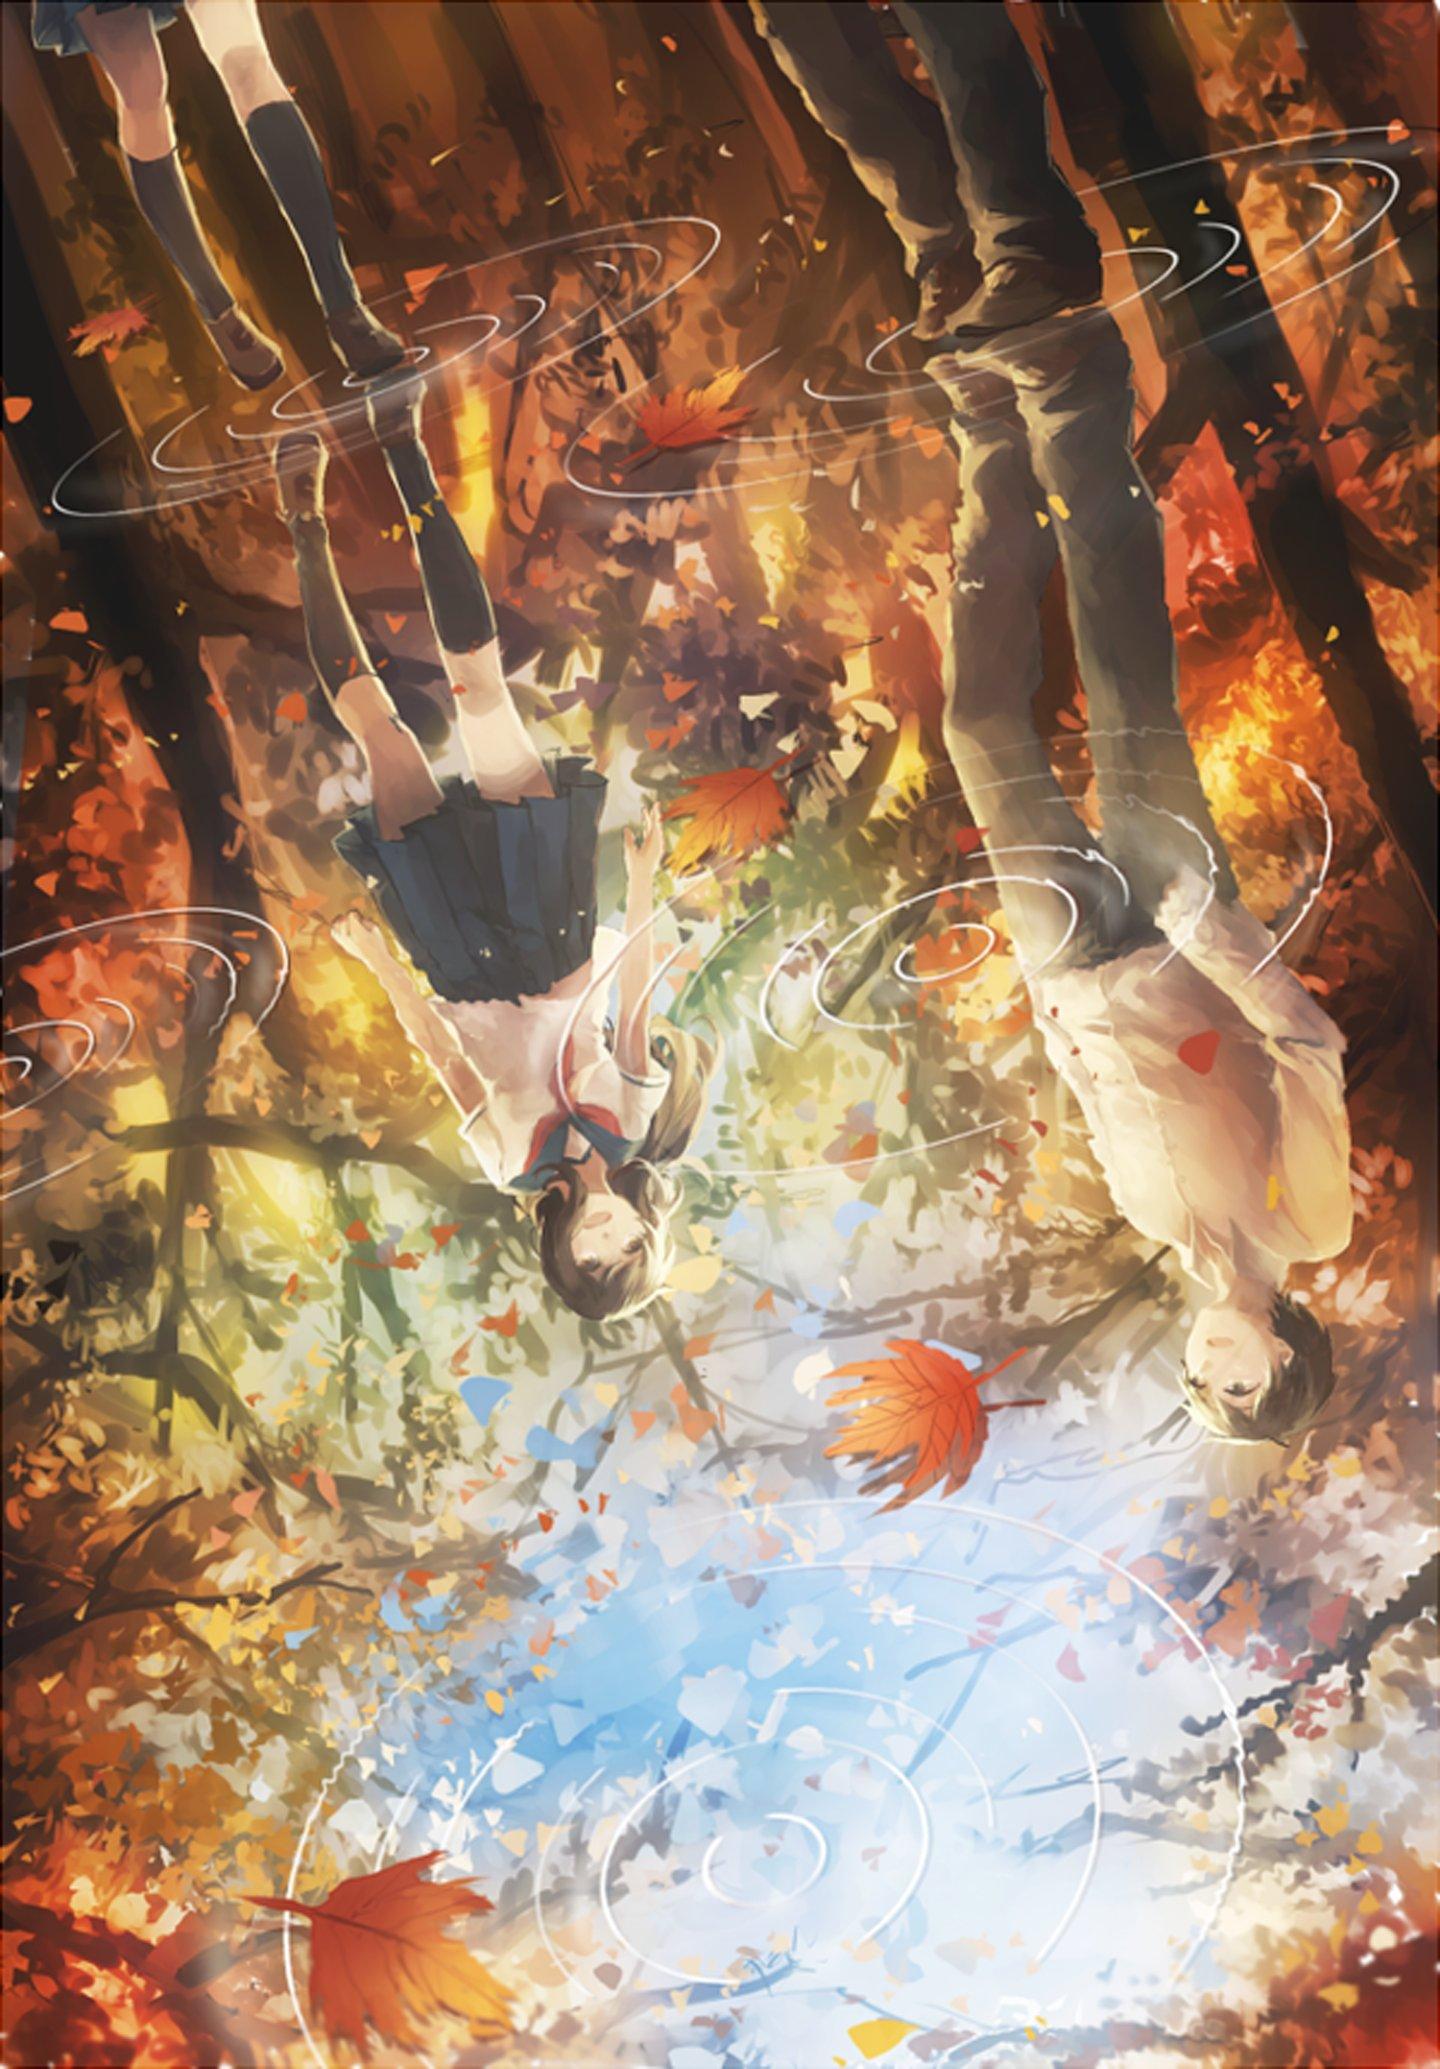 Fall Thanksgiving Wallpaper Free Leaves Water Rain Couple Anime Girl Guy Autumn Wallpaper